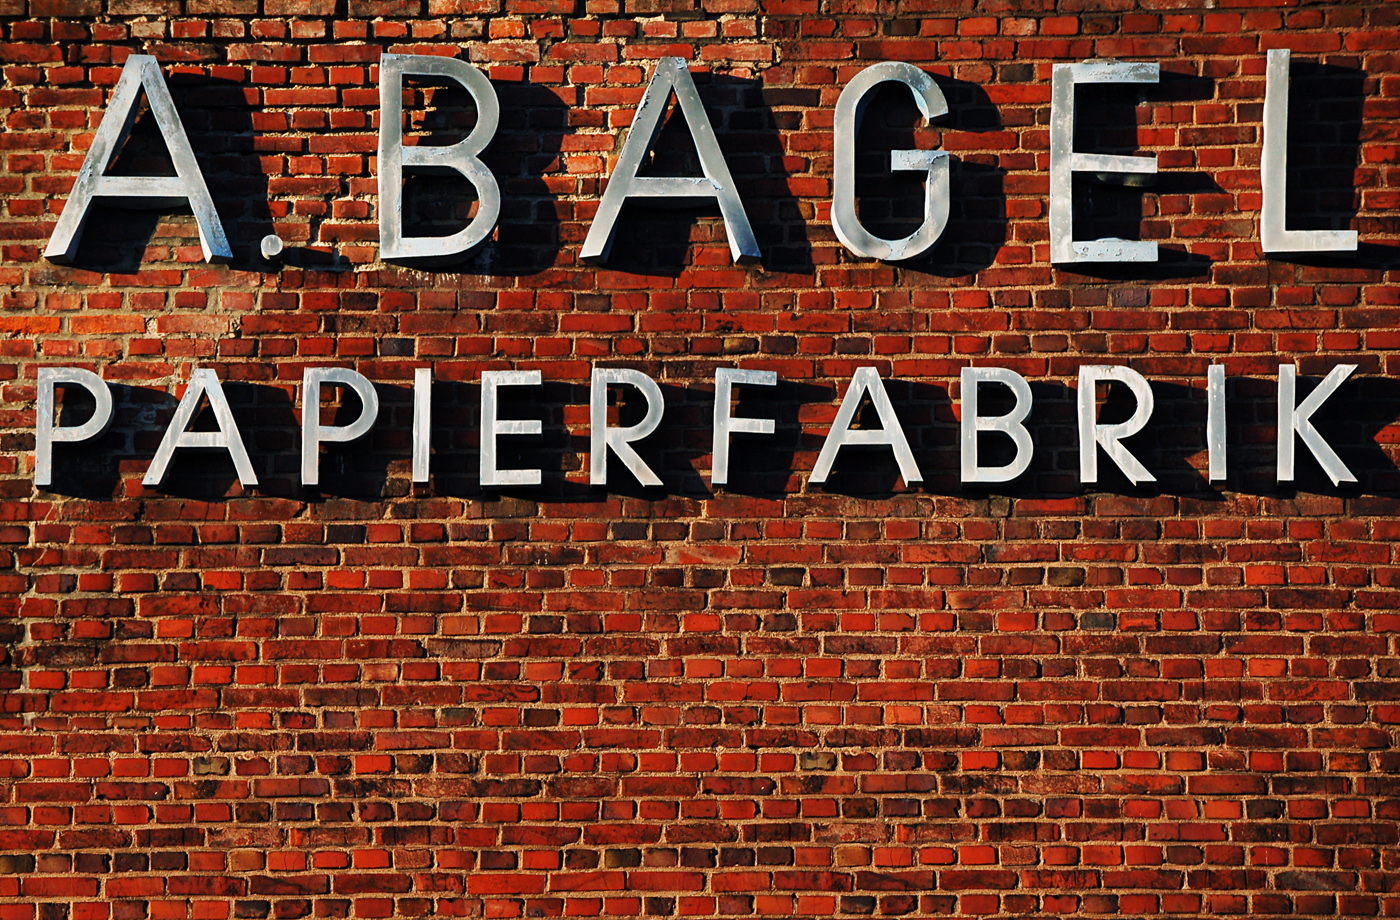 A. Bagel